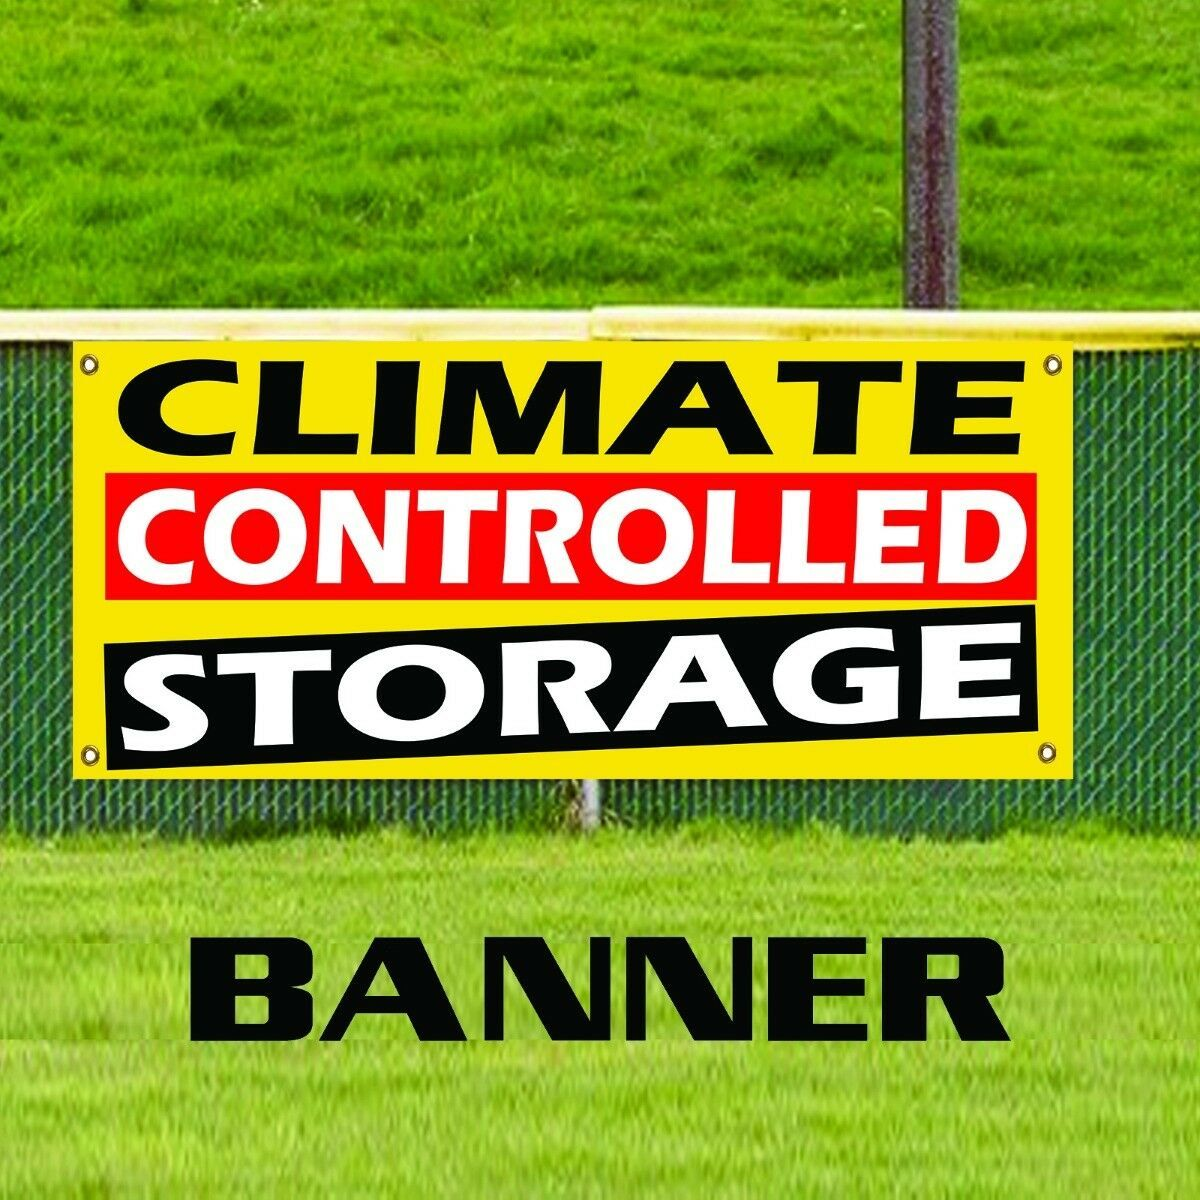 Https Ift Tt 32avgj5 Outdoor Storage Ideas Of Outdoor Storage Outdoor Storage Climate Controlled In 2020 Vinyl Banners Business Signs Outdoor Vinyl Banners